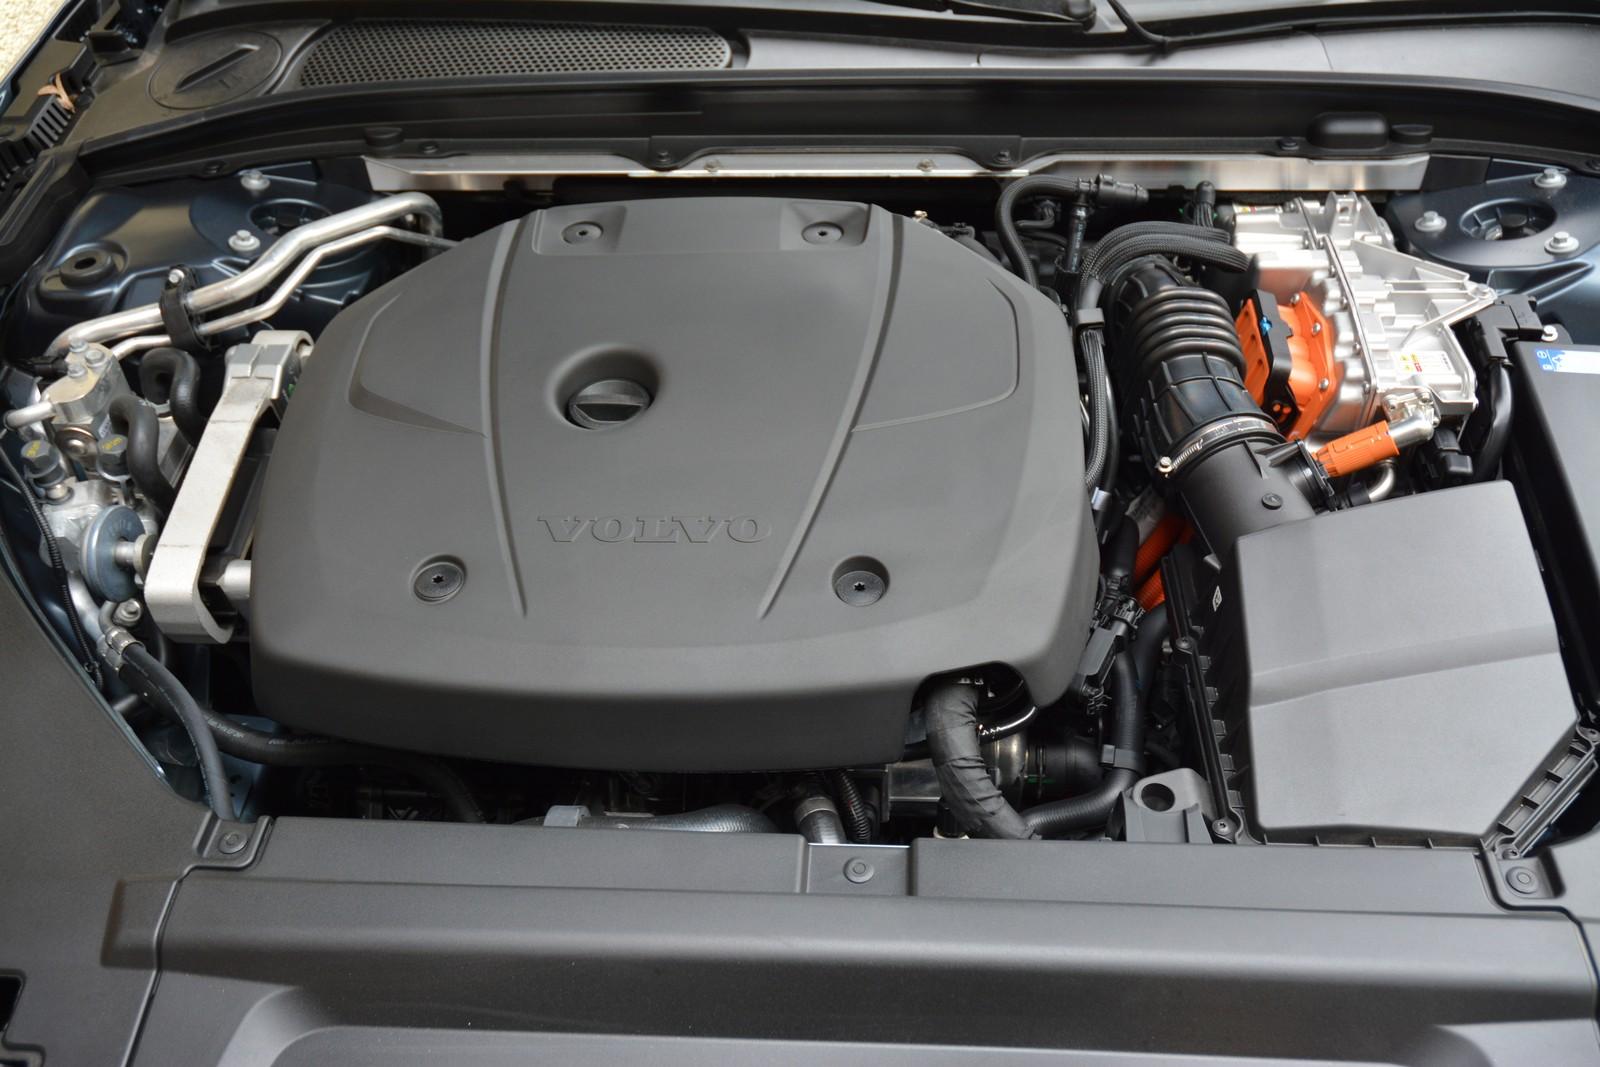 Volvo V90 Fahrbericht Von Bfp Fuhrpark 2019 Als Motorisierung T8